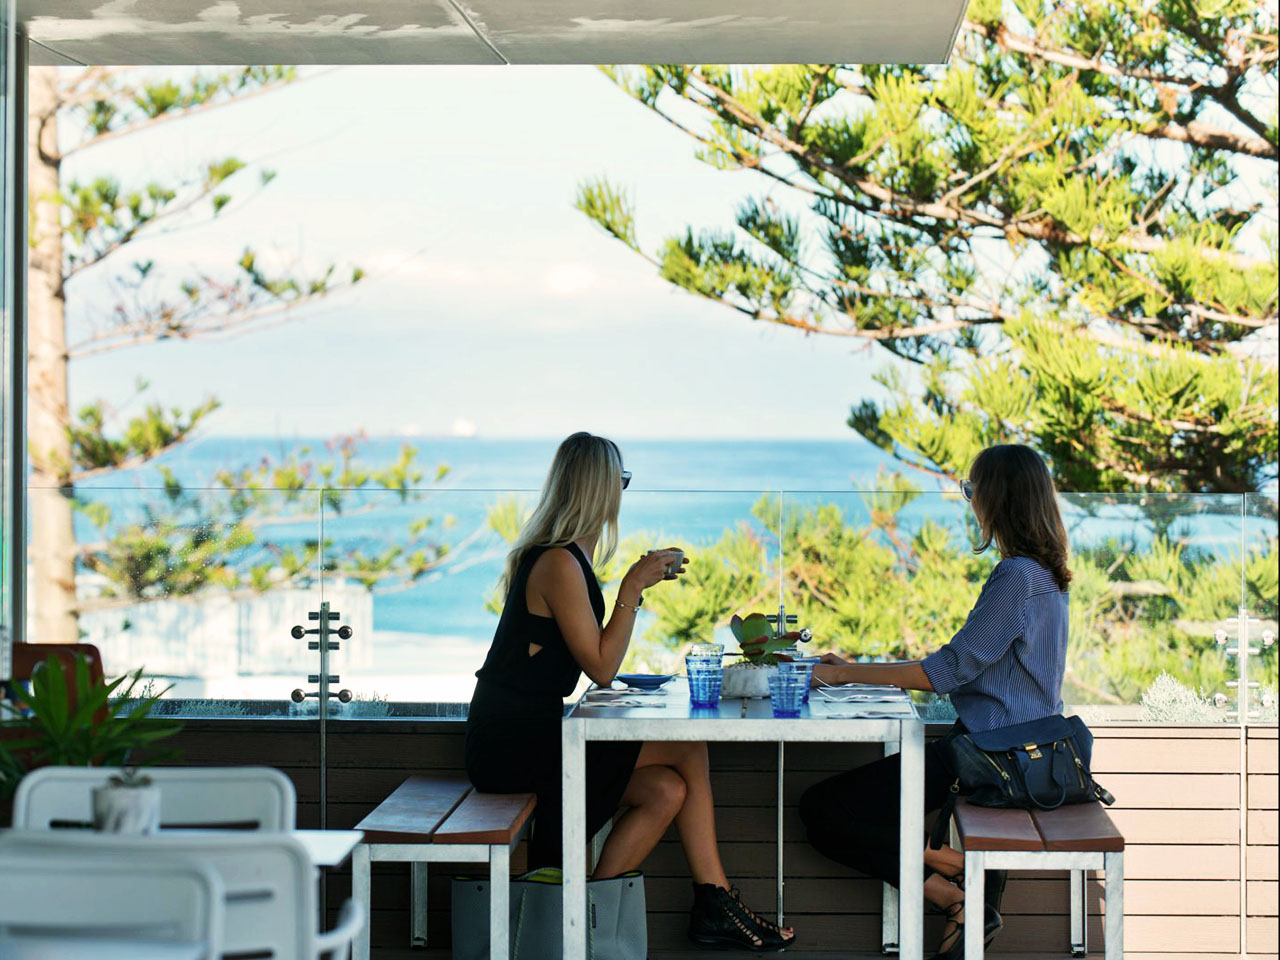 2 Women Sitting And Enjoying The Ocean View